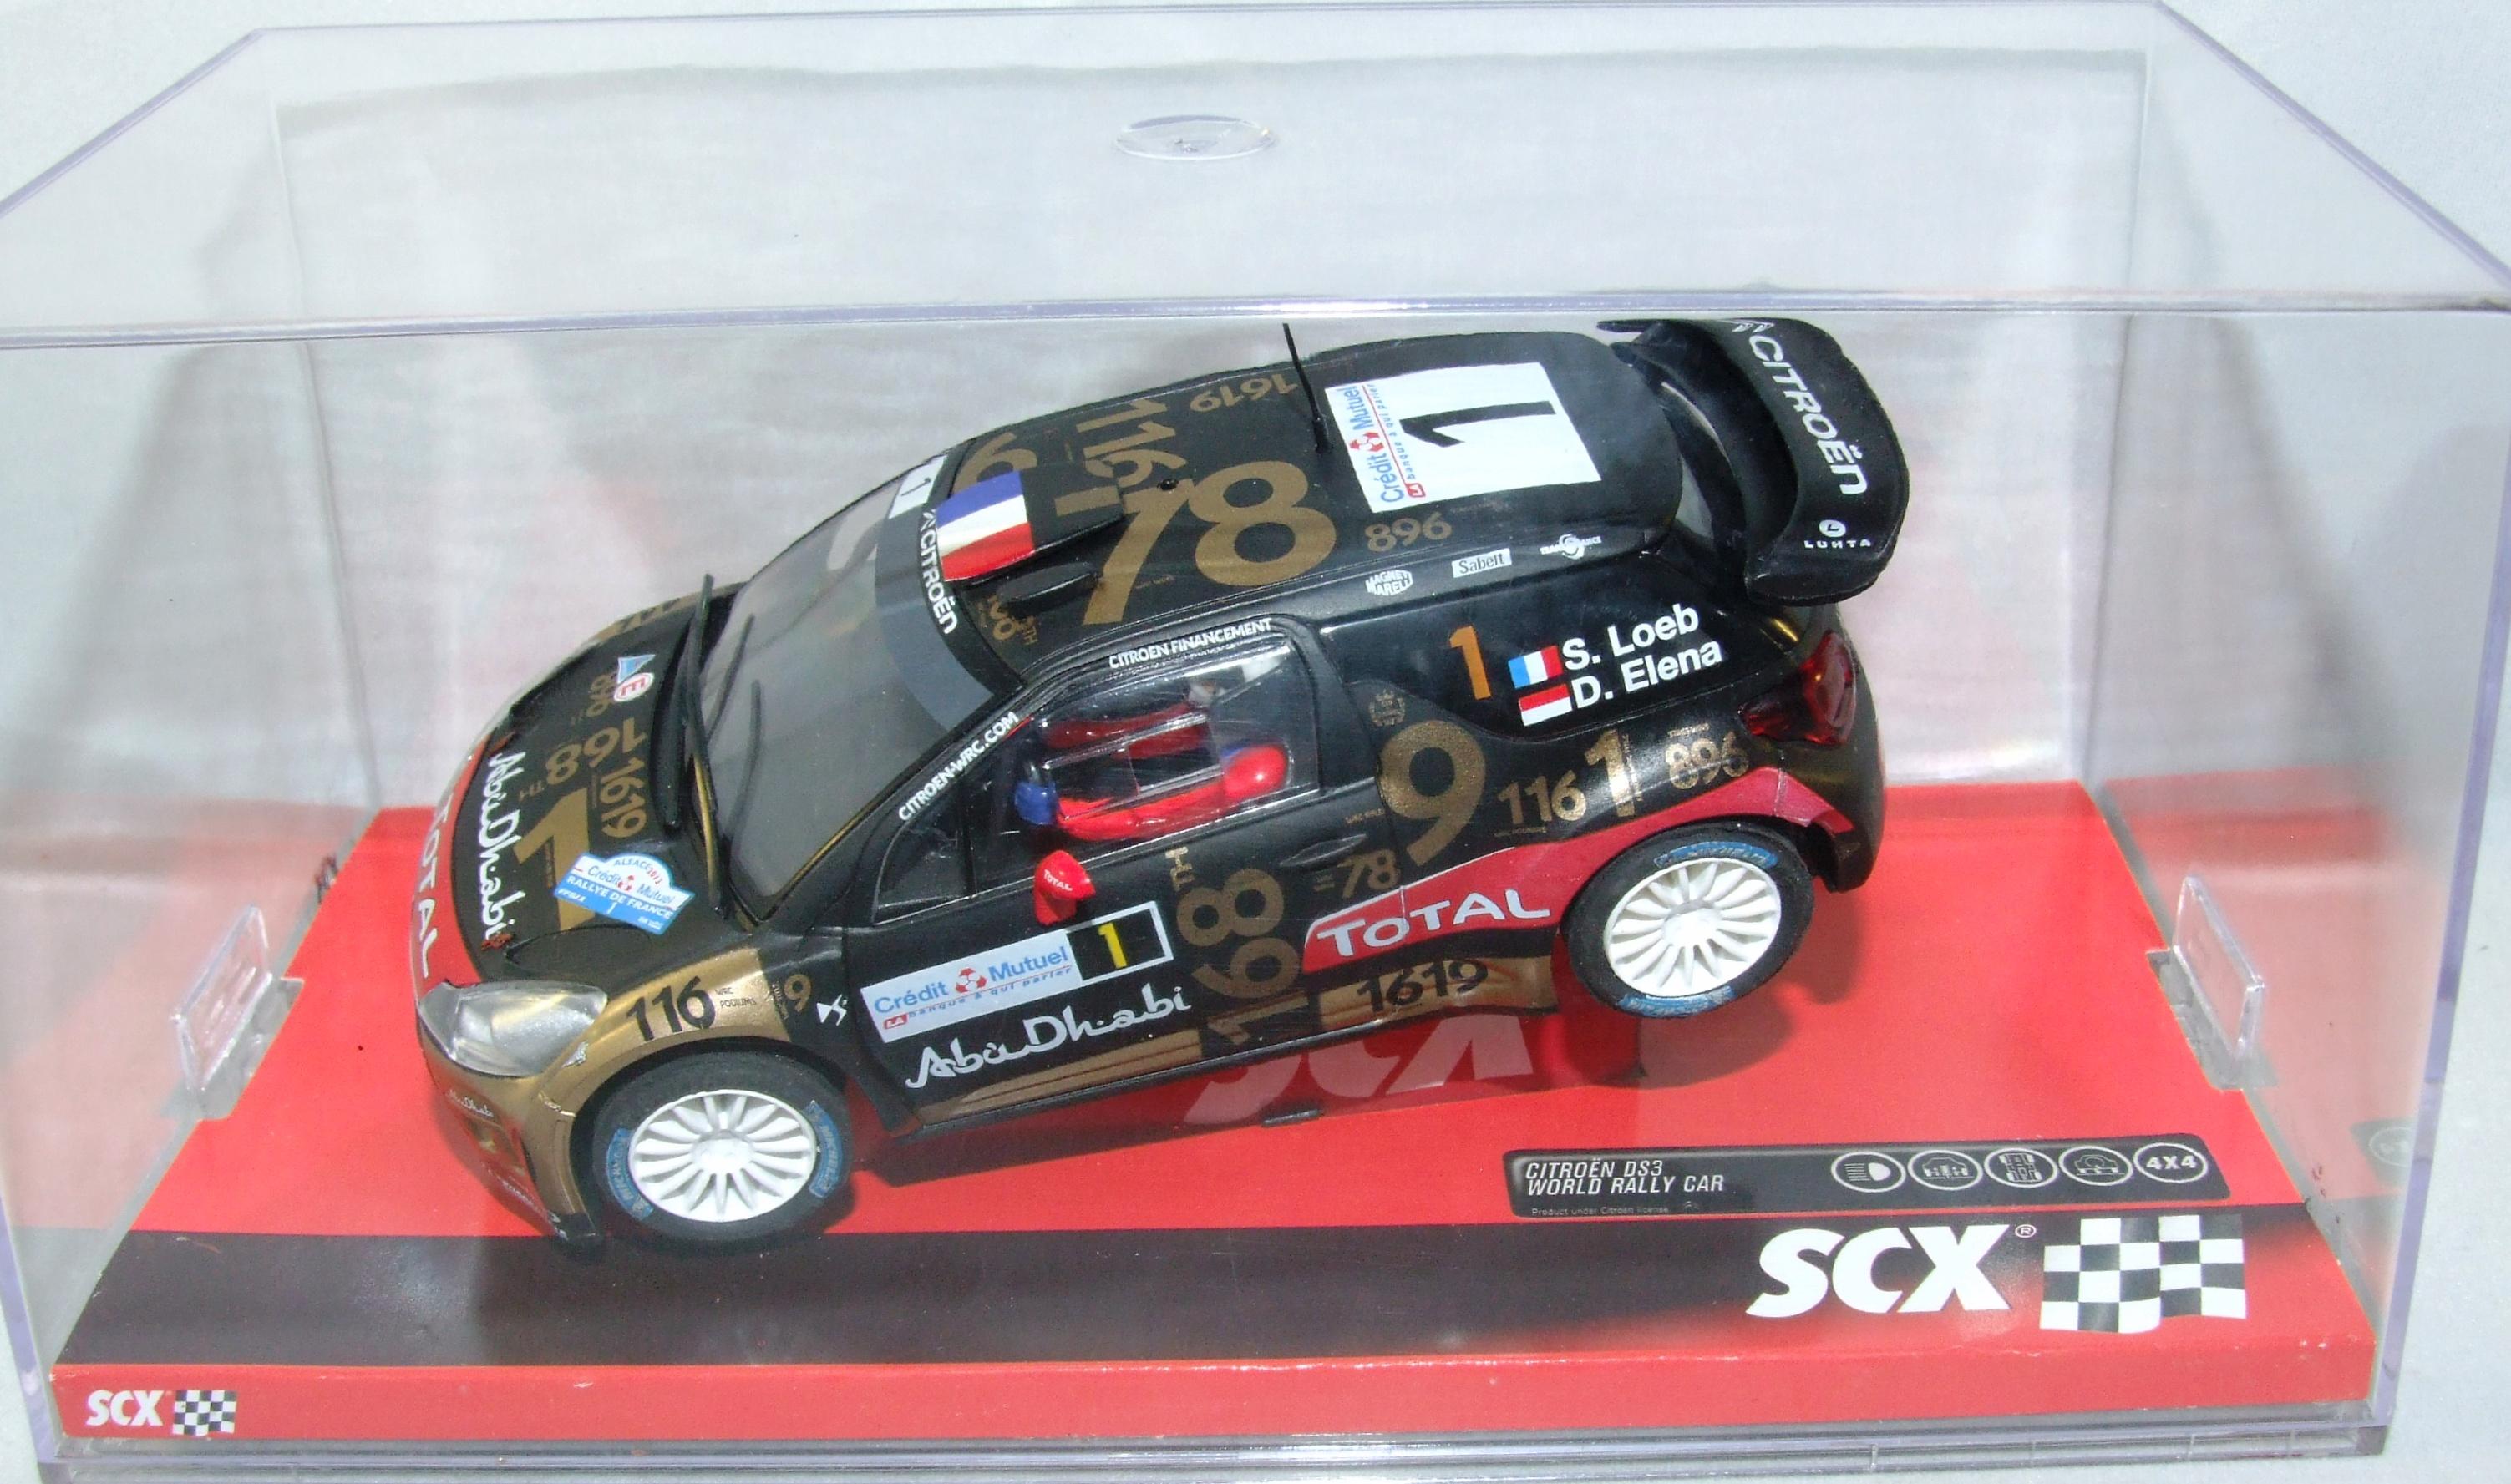 SCX 10A10208 Citroen DS 3 WRC Loeb-Elena 1:32 analog NEU & OVP